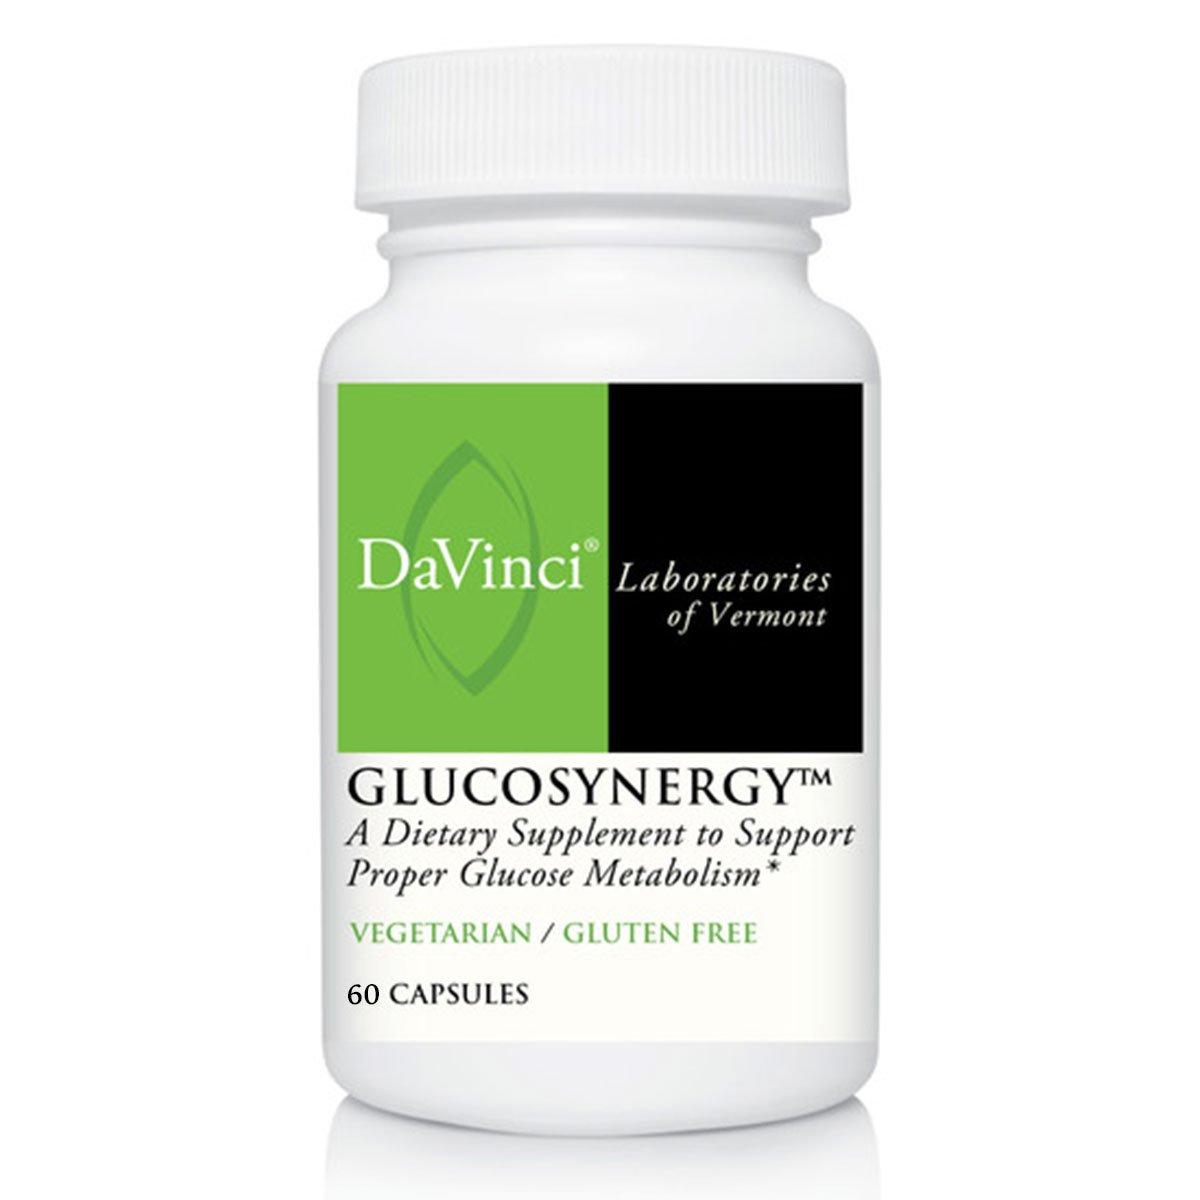 Davinci Labs - GlucoSynergy - 60 Capsules